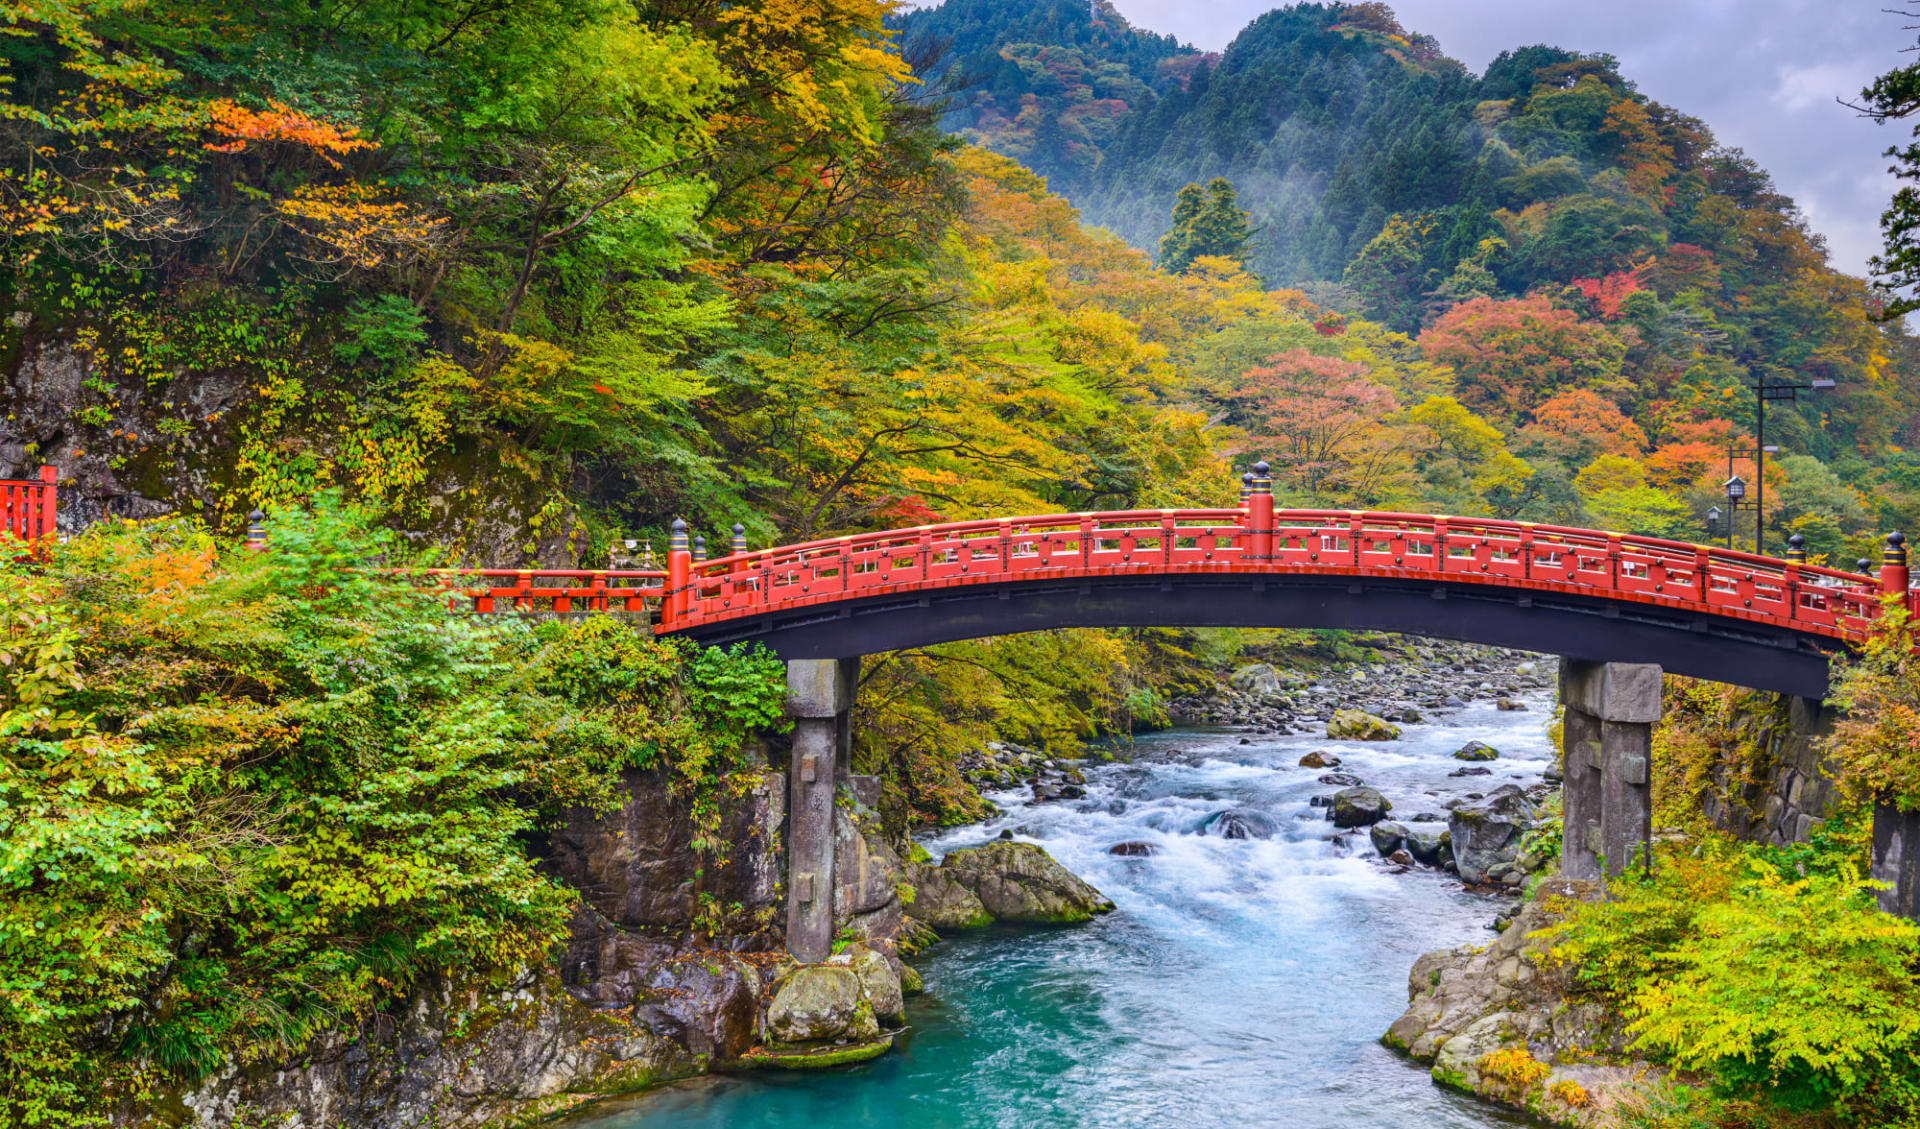 Gruppenreise «Im Reich der Sonnengöttin» ab Kyoto: Nikko at the Shinkyo Bridge over the Daiwa River